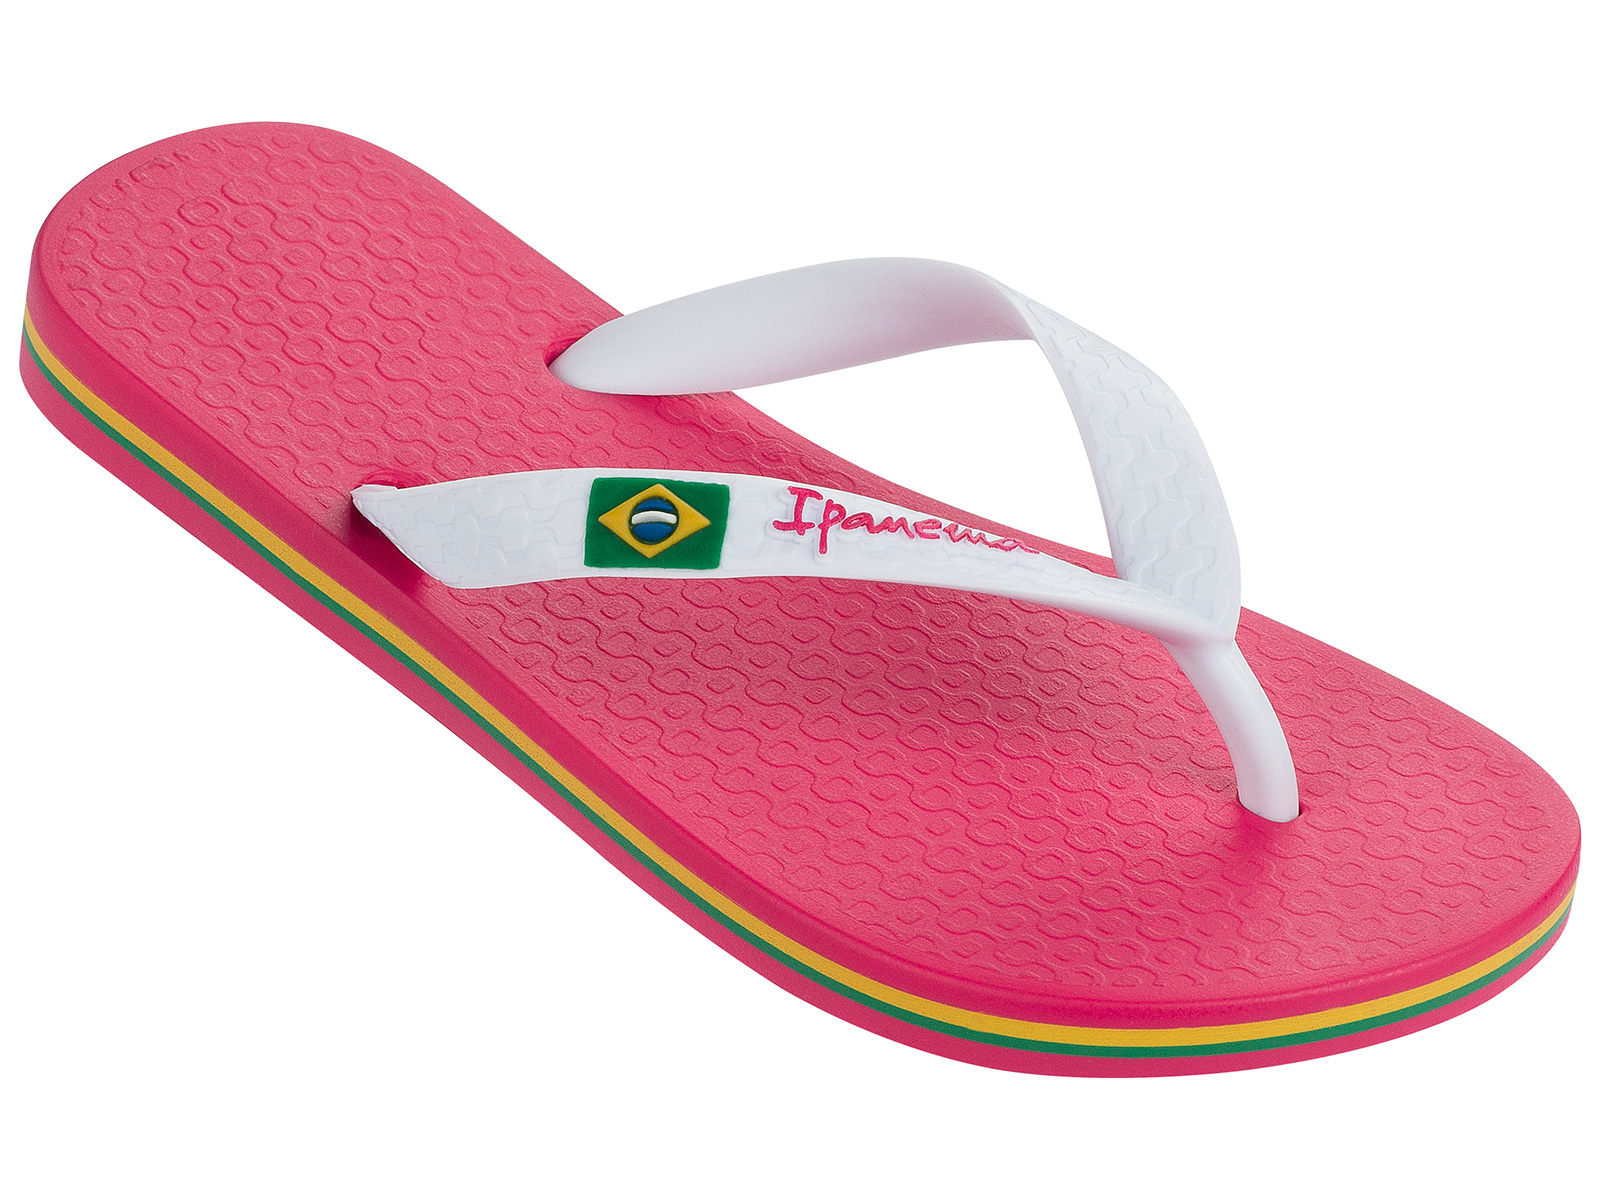 ipanema flip flops ipanema classica brasil ii kids pink white. Black Bedroom Furniture Sets. Home Design Ideas